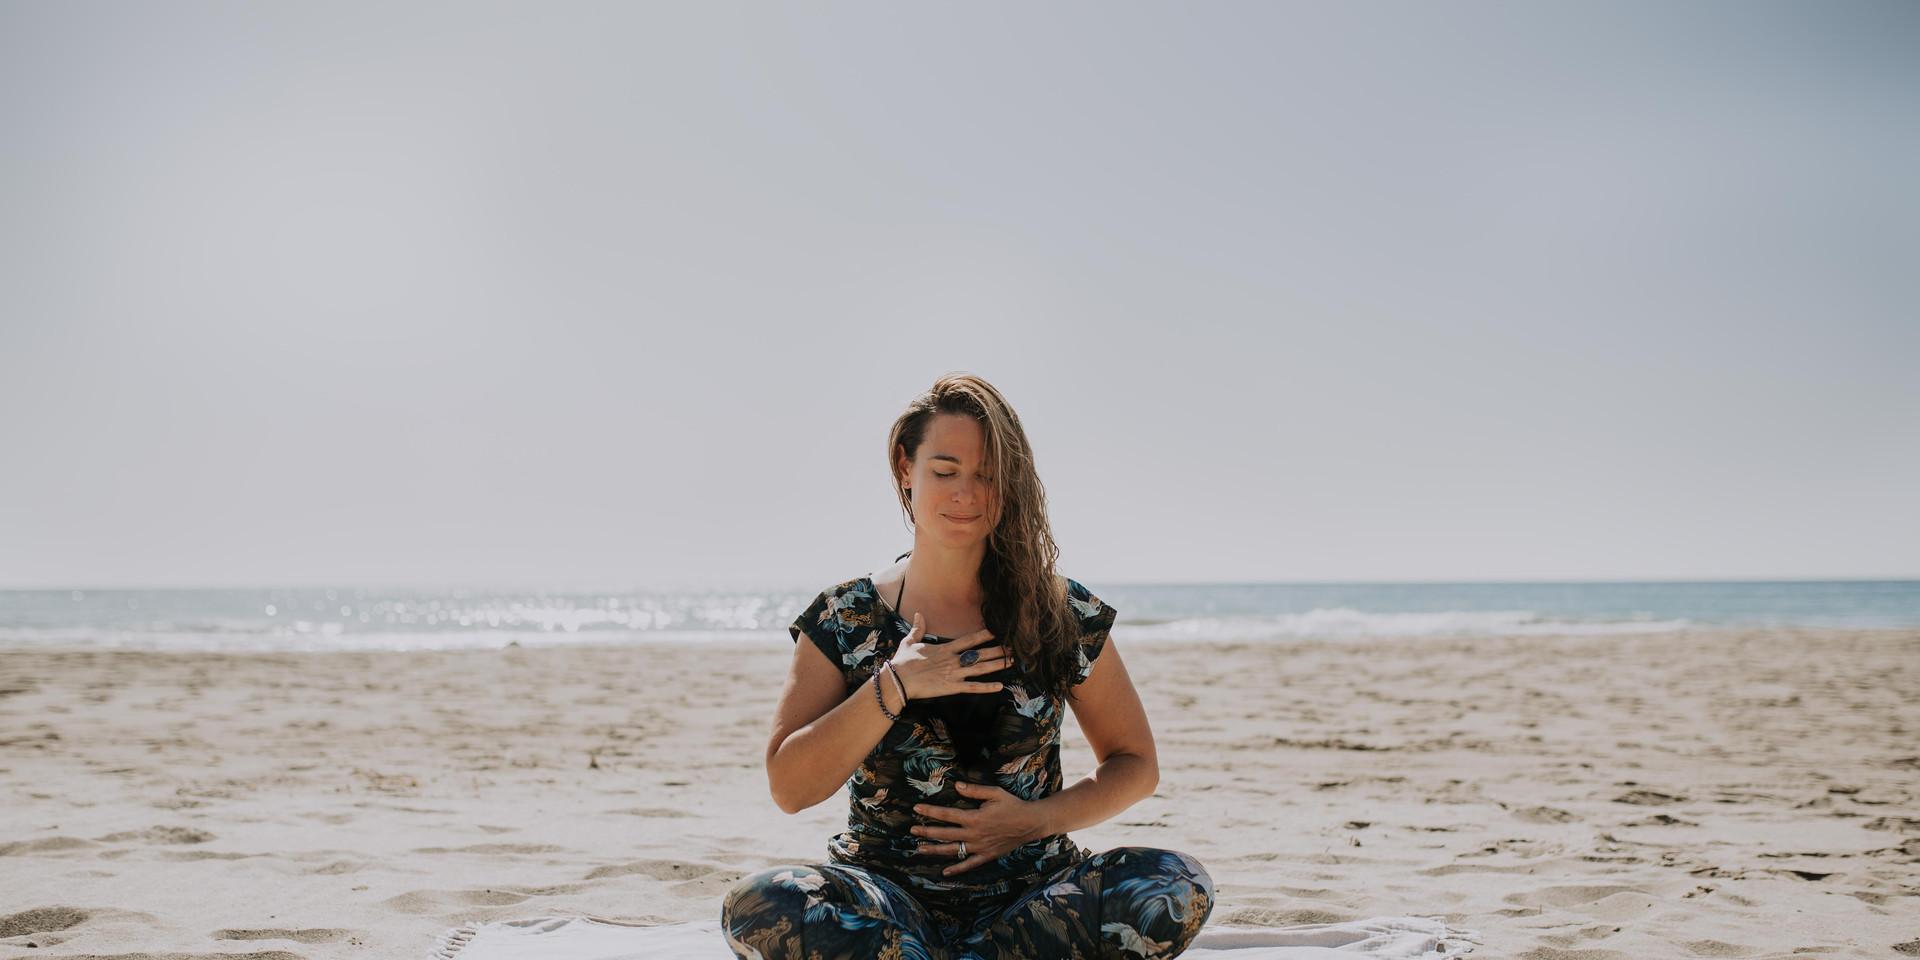 Yoga Beach Brand Photo Shoot